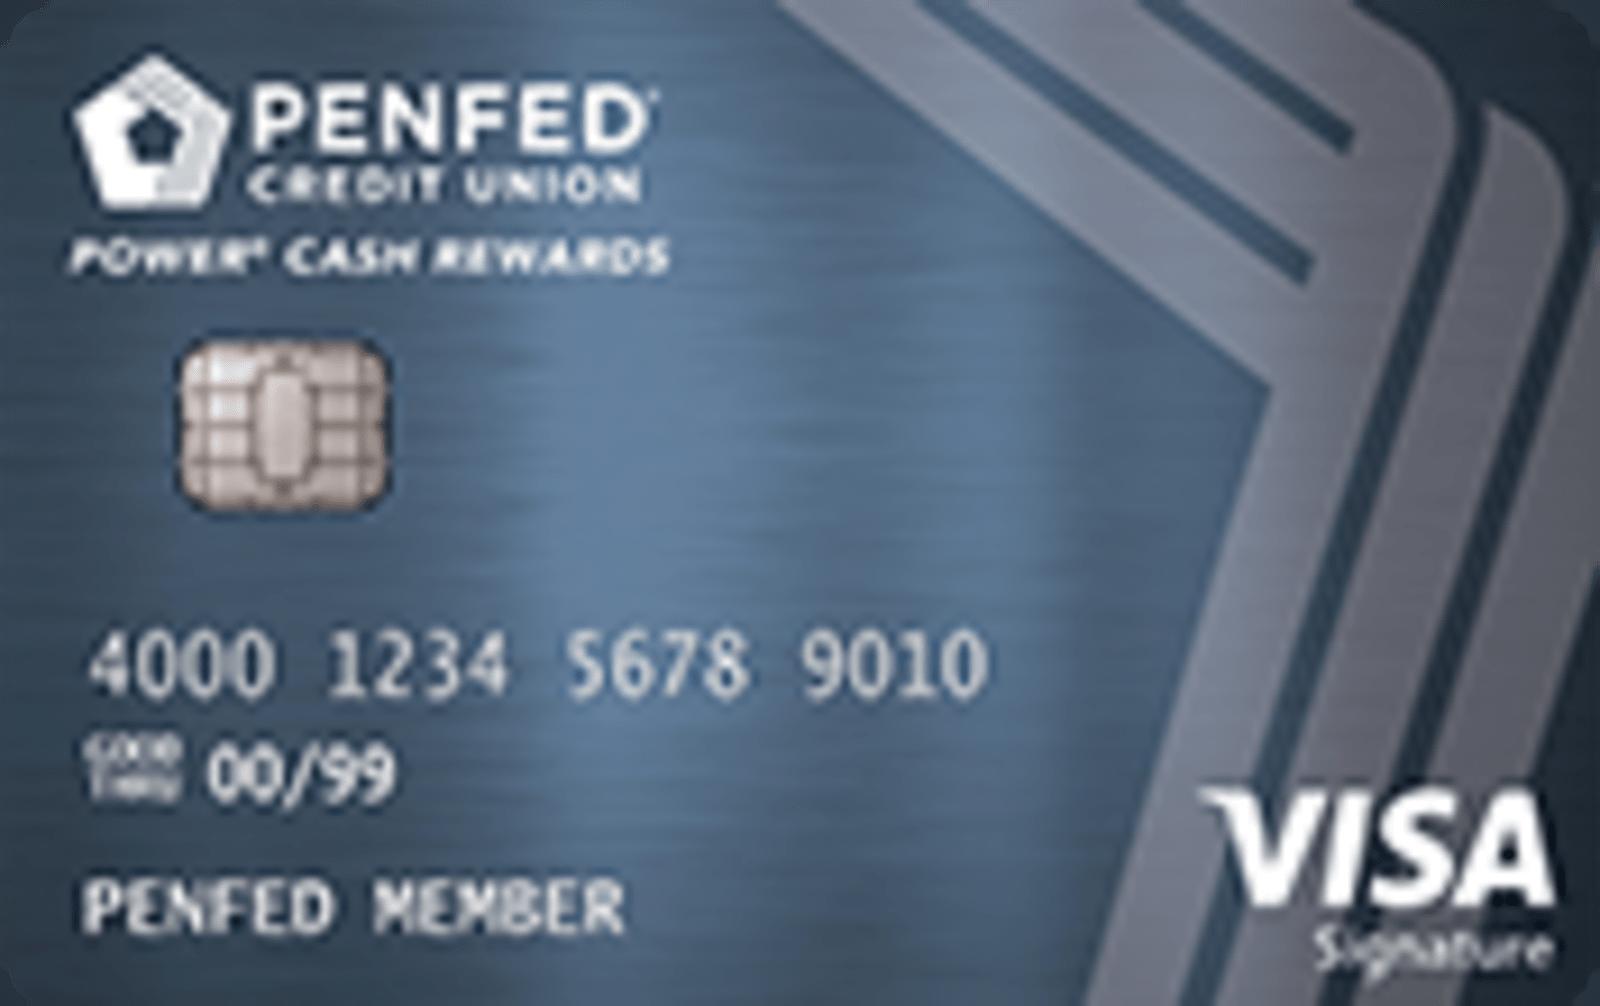 PenFed Power Cash Rewards